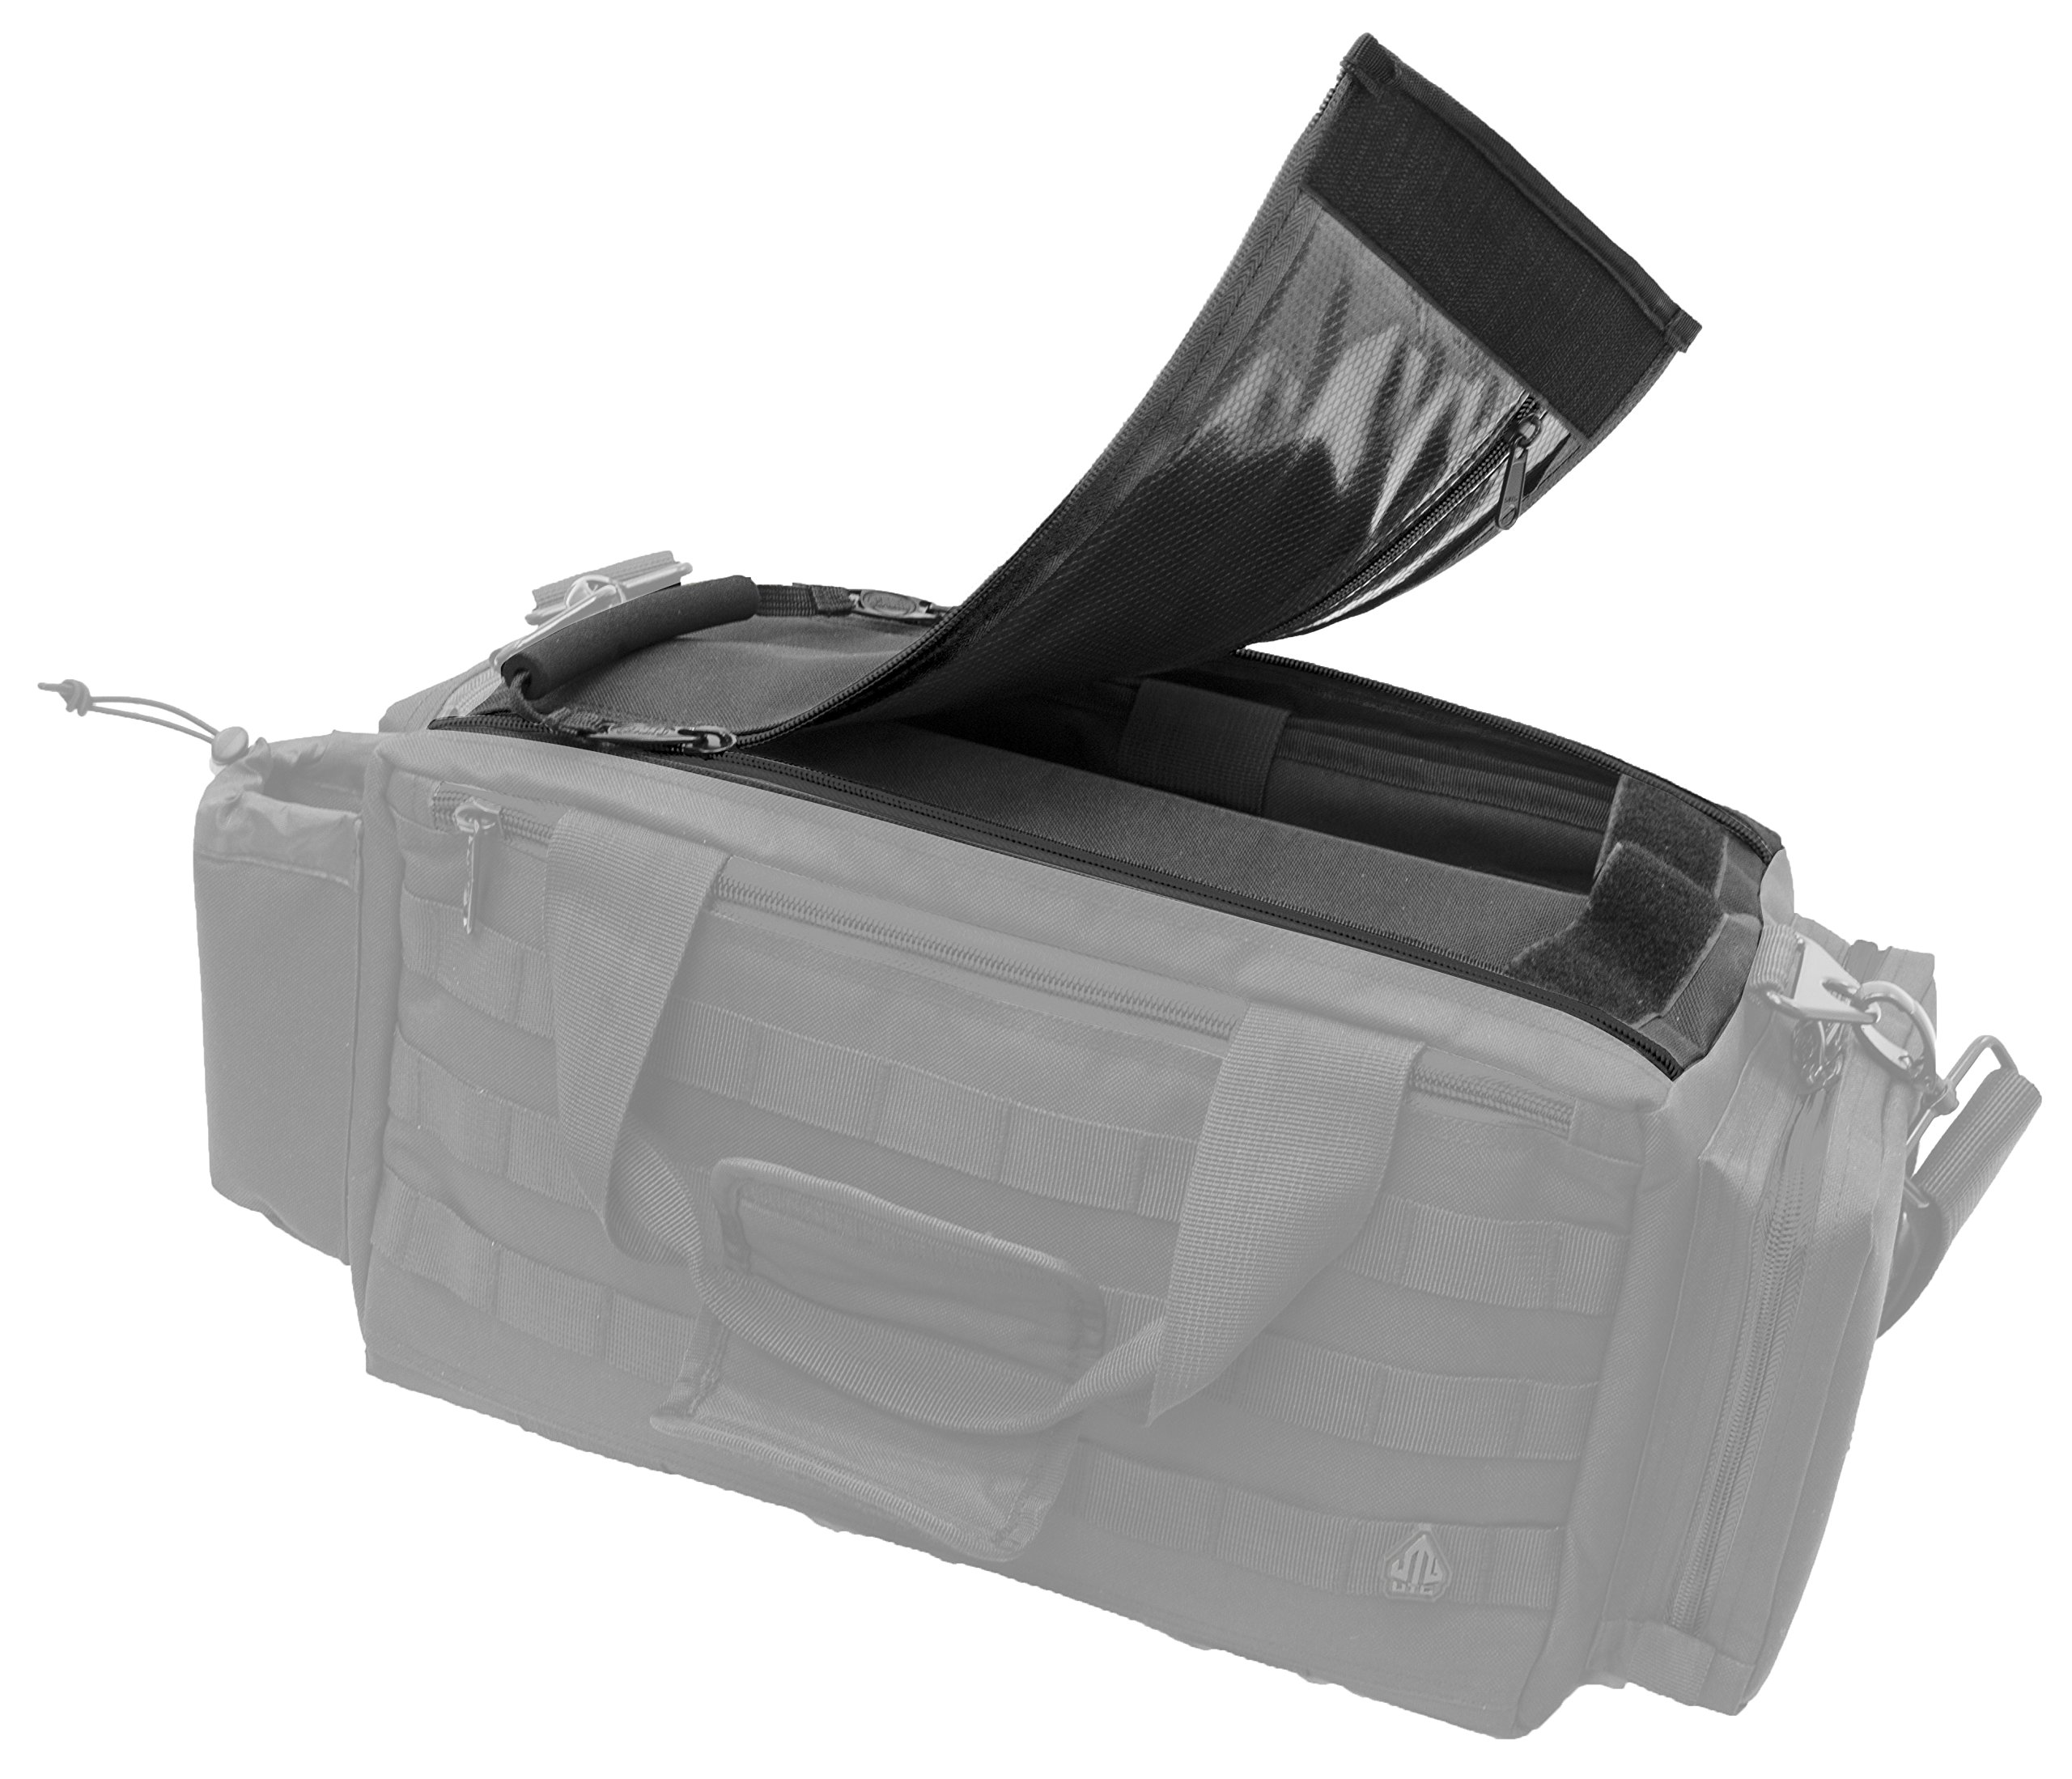 UTG All in One Range/Utility Go Bag, Black, 21'' x 10'' x 9'' by UTG (Image #6)